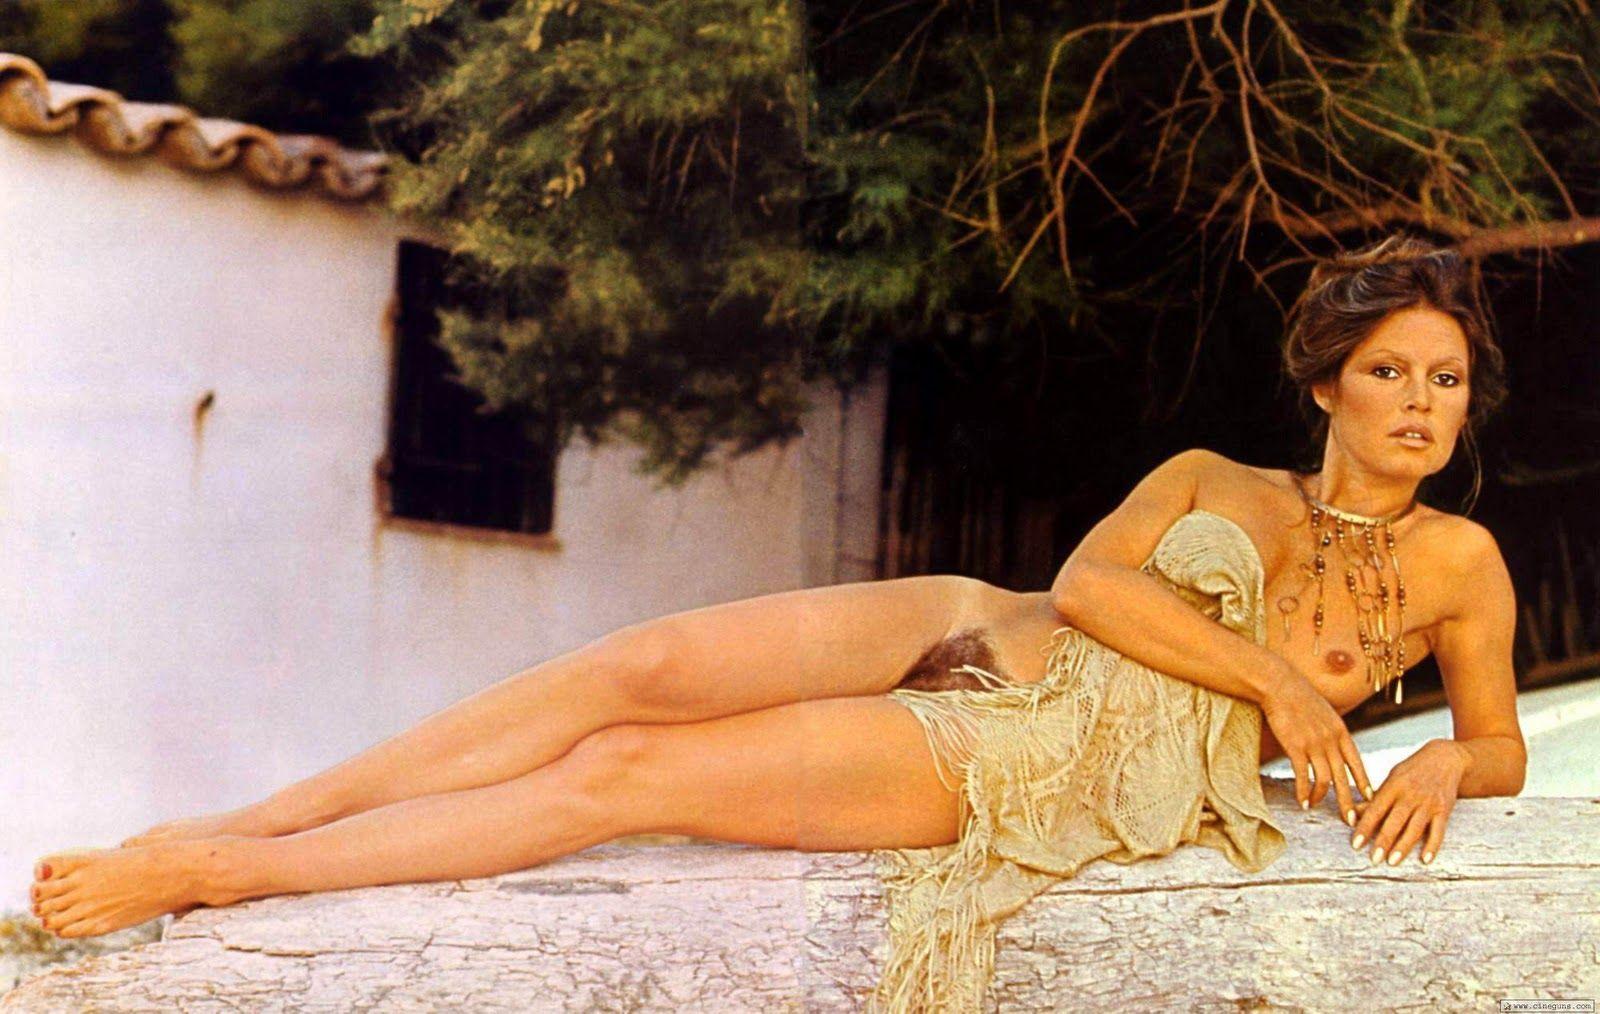 risultati immagini per bardot camel toe | brigitte bardot